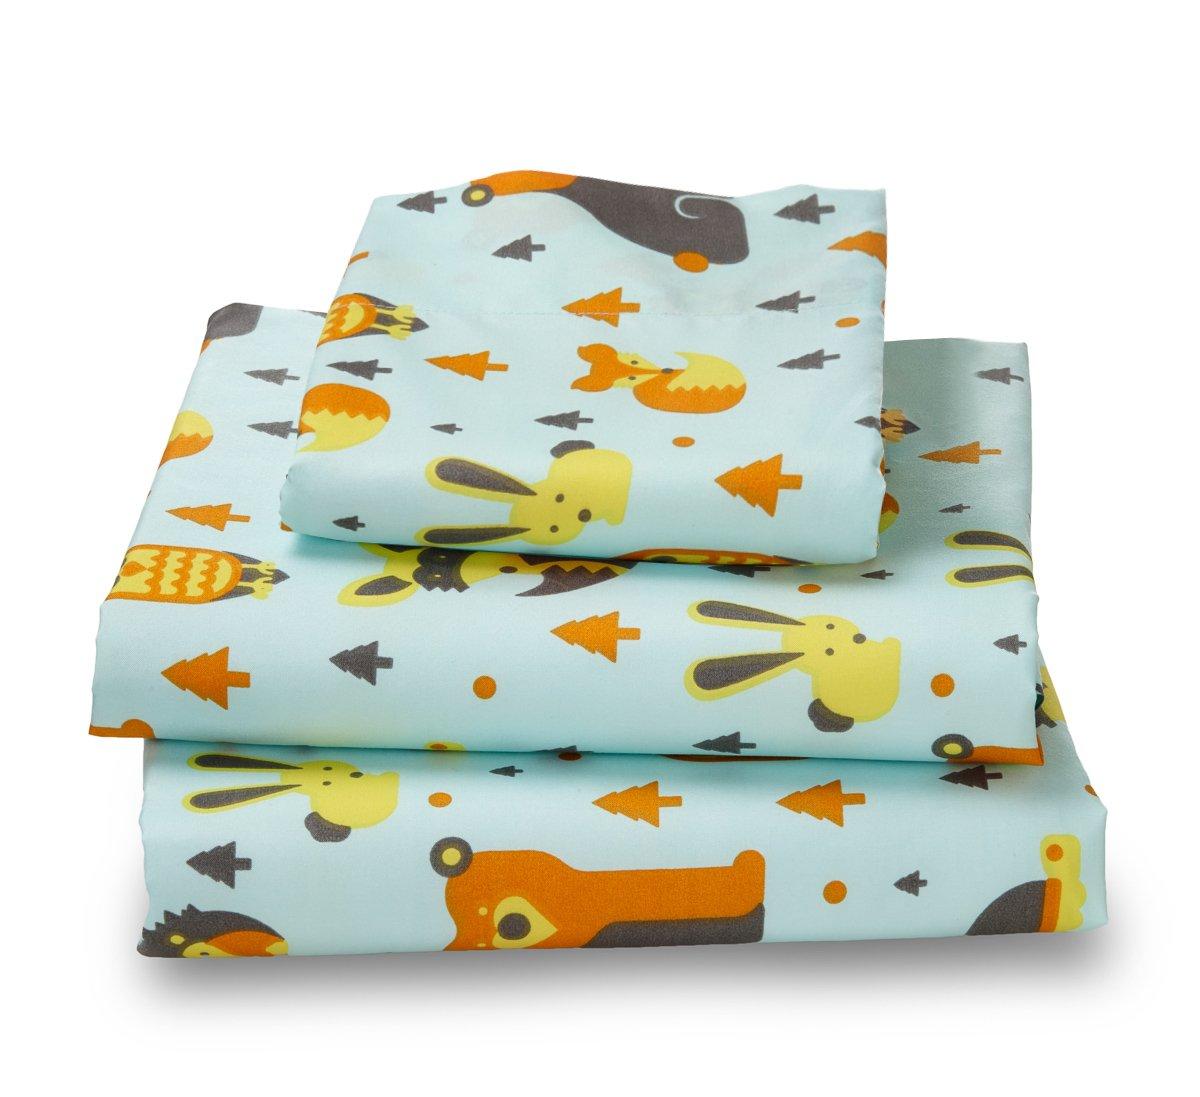 Full Sheet Set Woodland Print for Kids Bedding